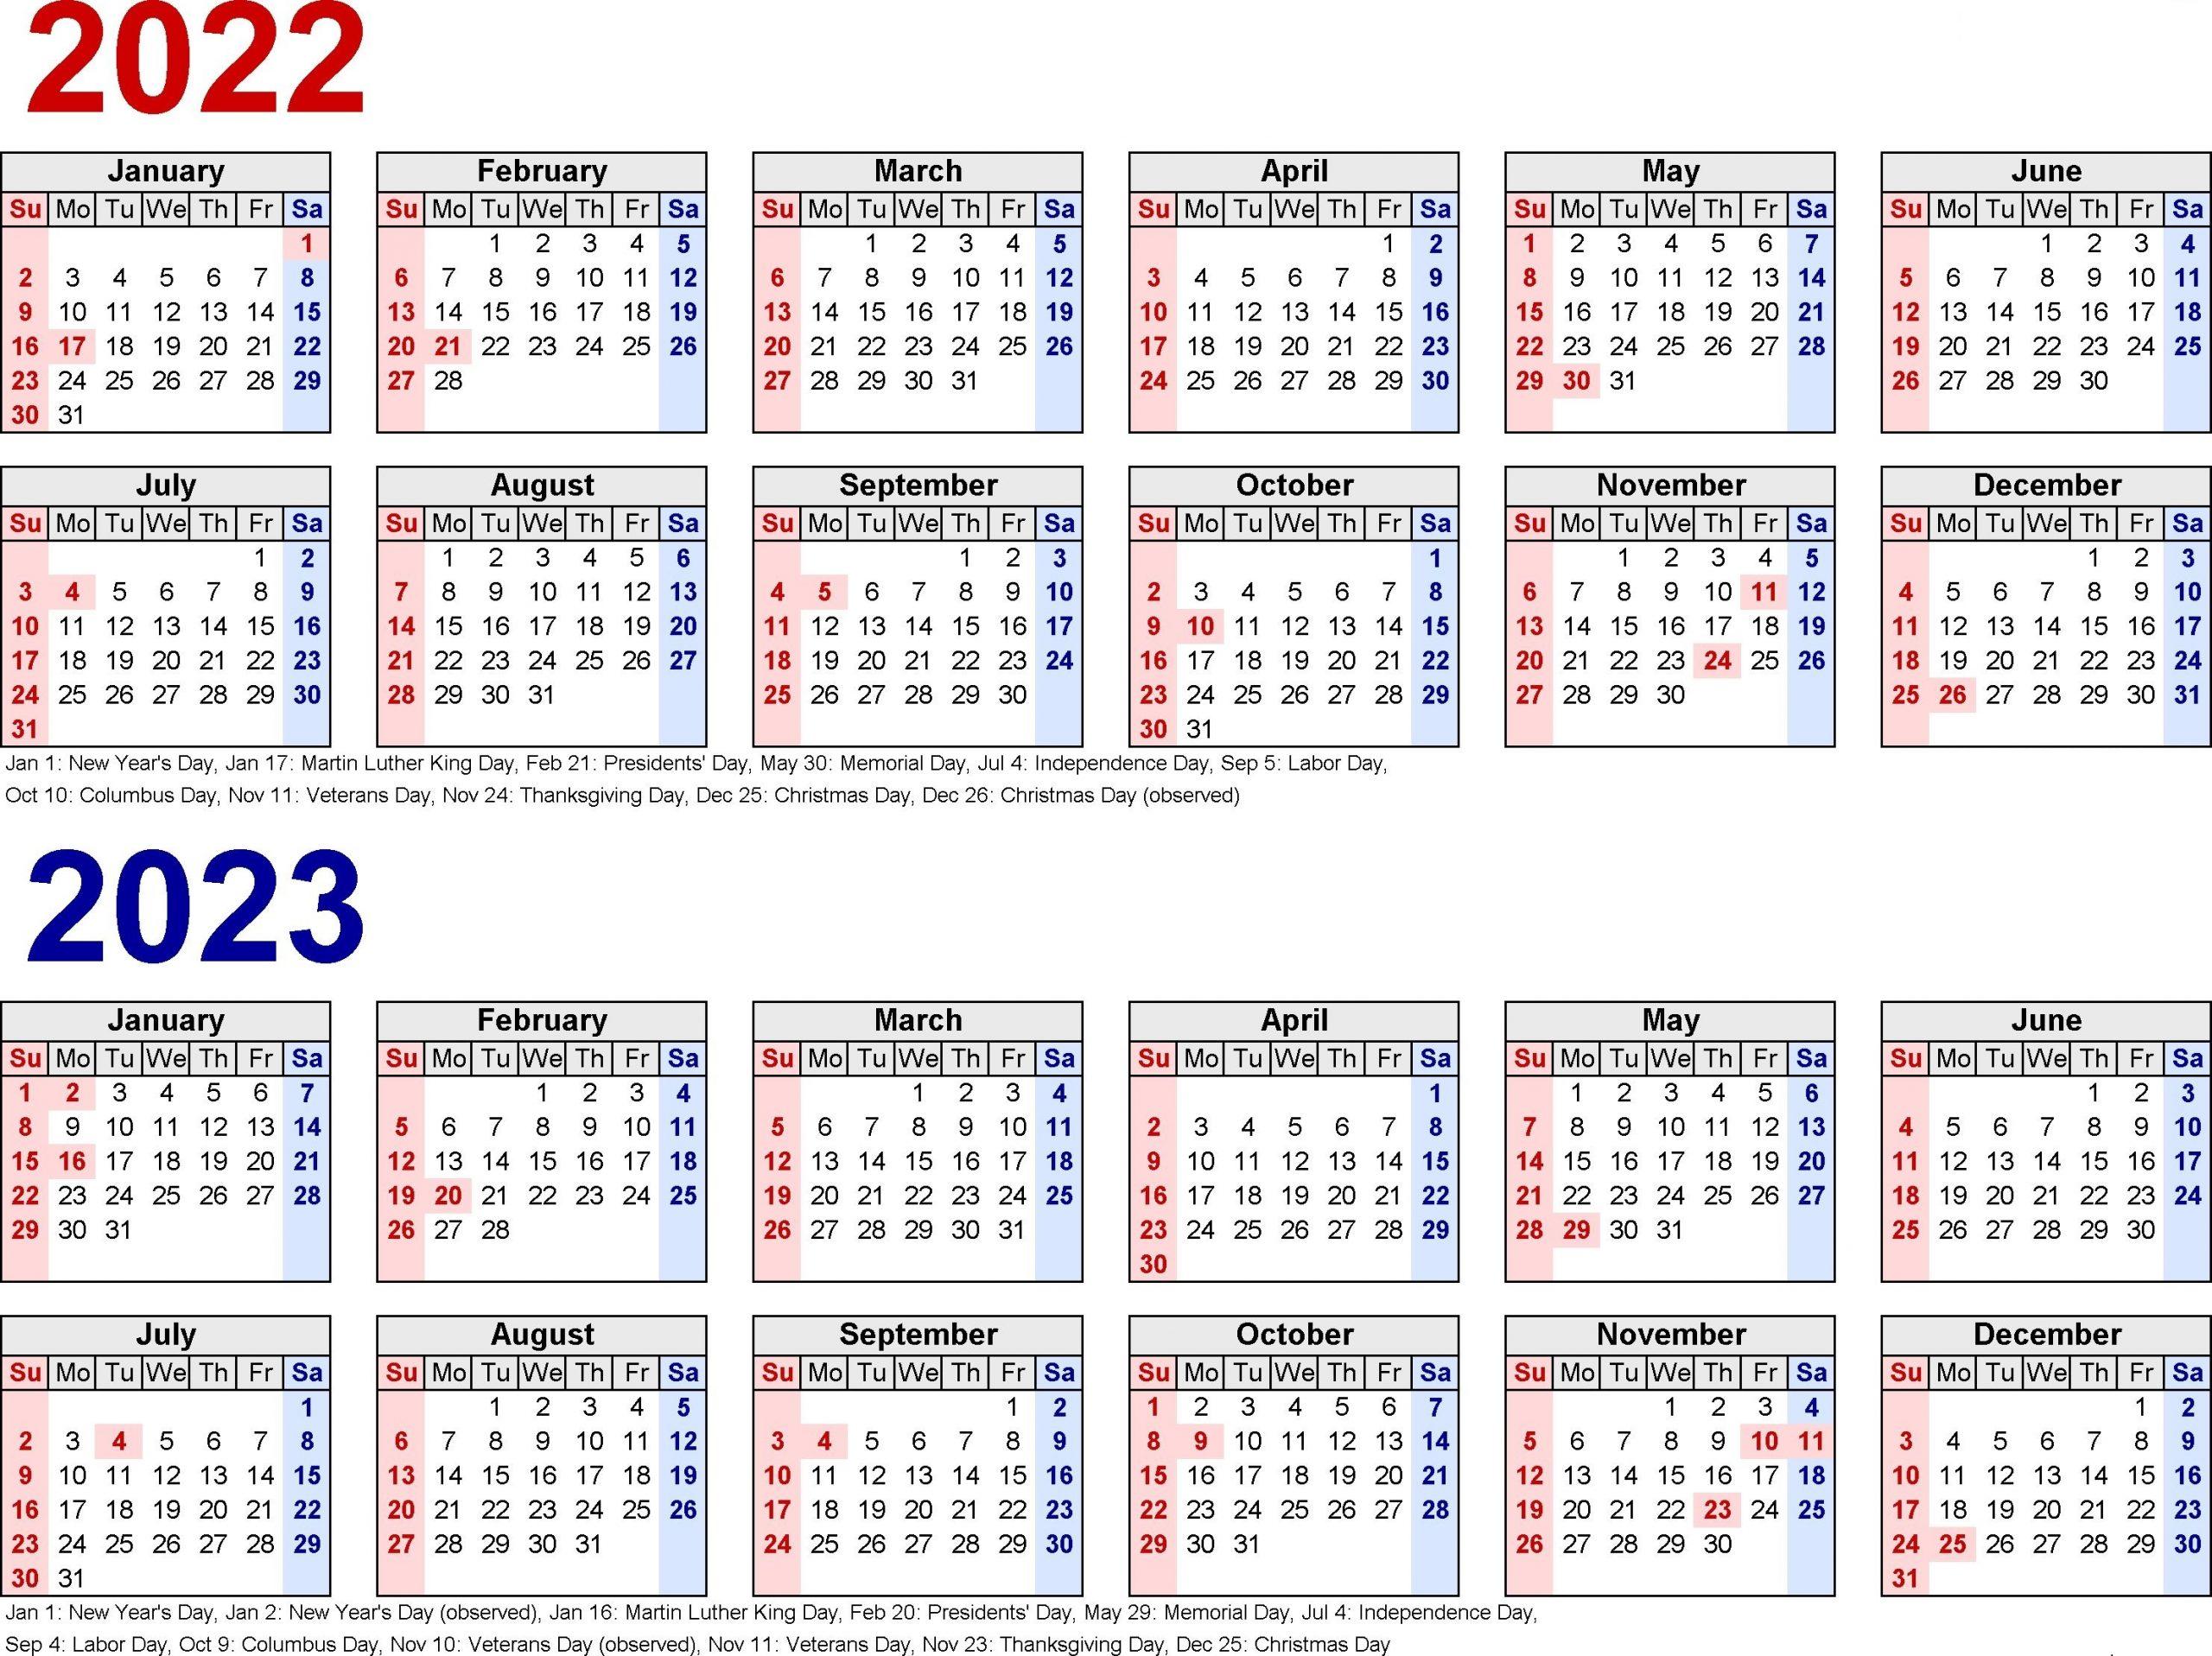 2022 Biweekly Payroll Calendar Template